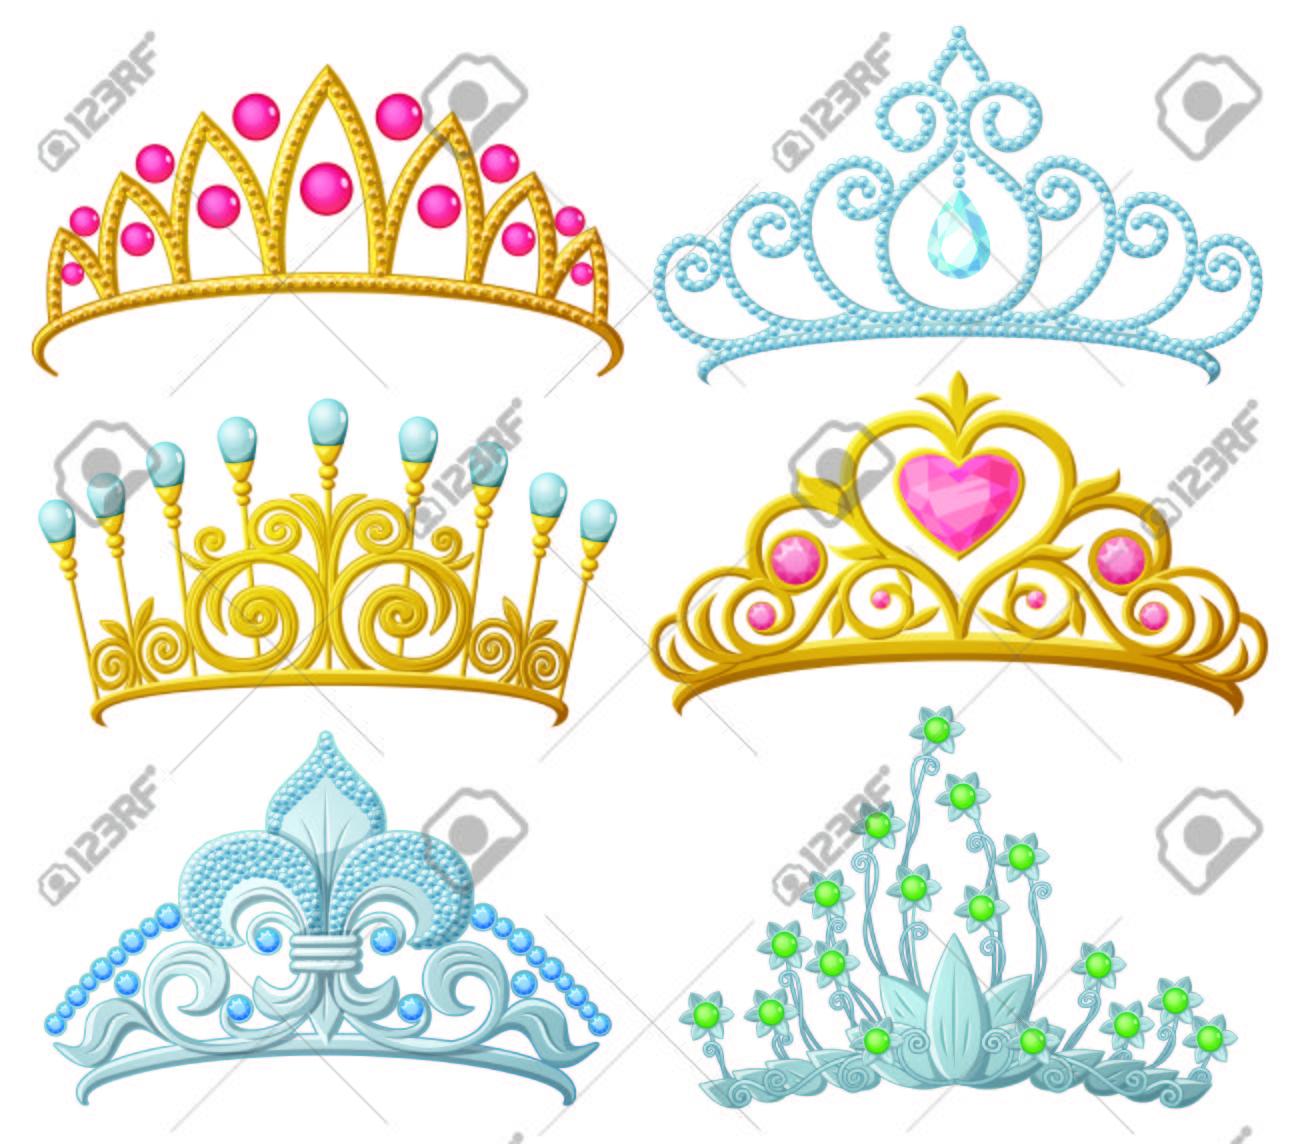 Set of princess crowns (Tiara) isolated on white - 58314845